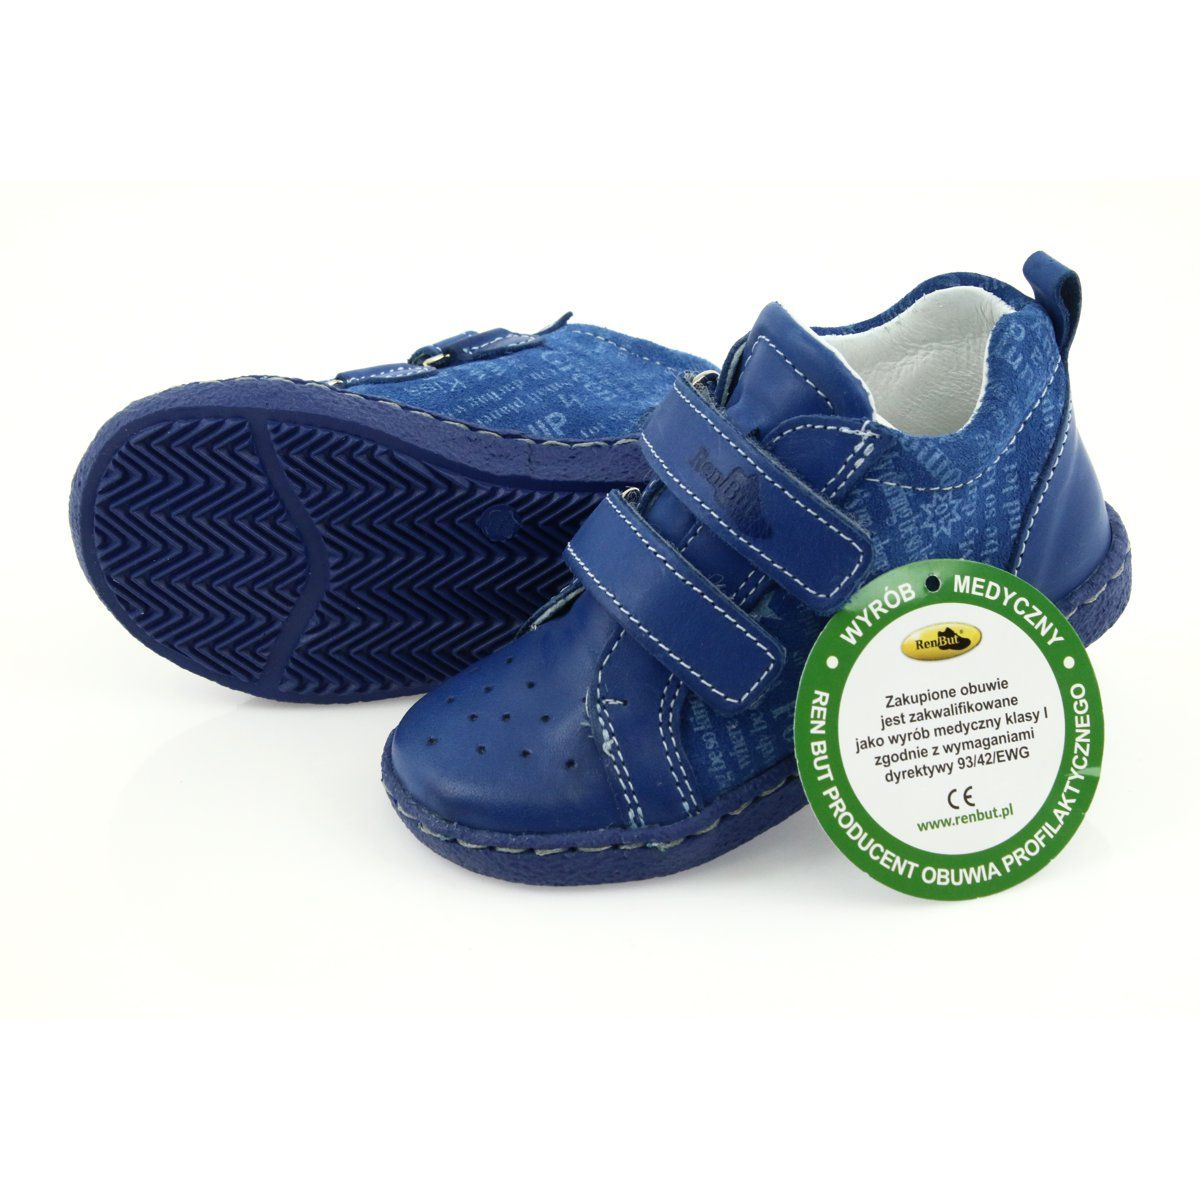 Classifieds | Children goods | Children shoes | Boy